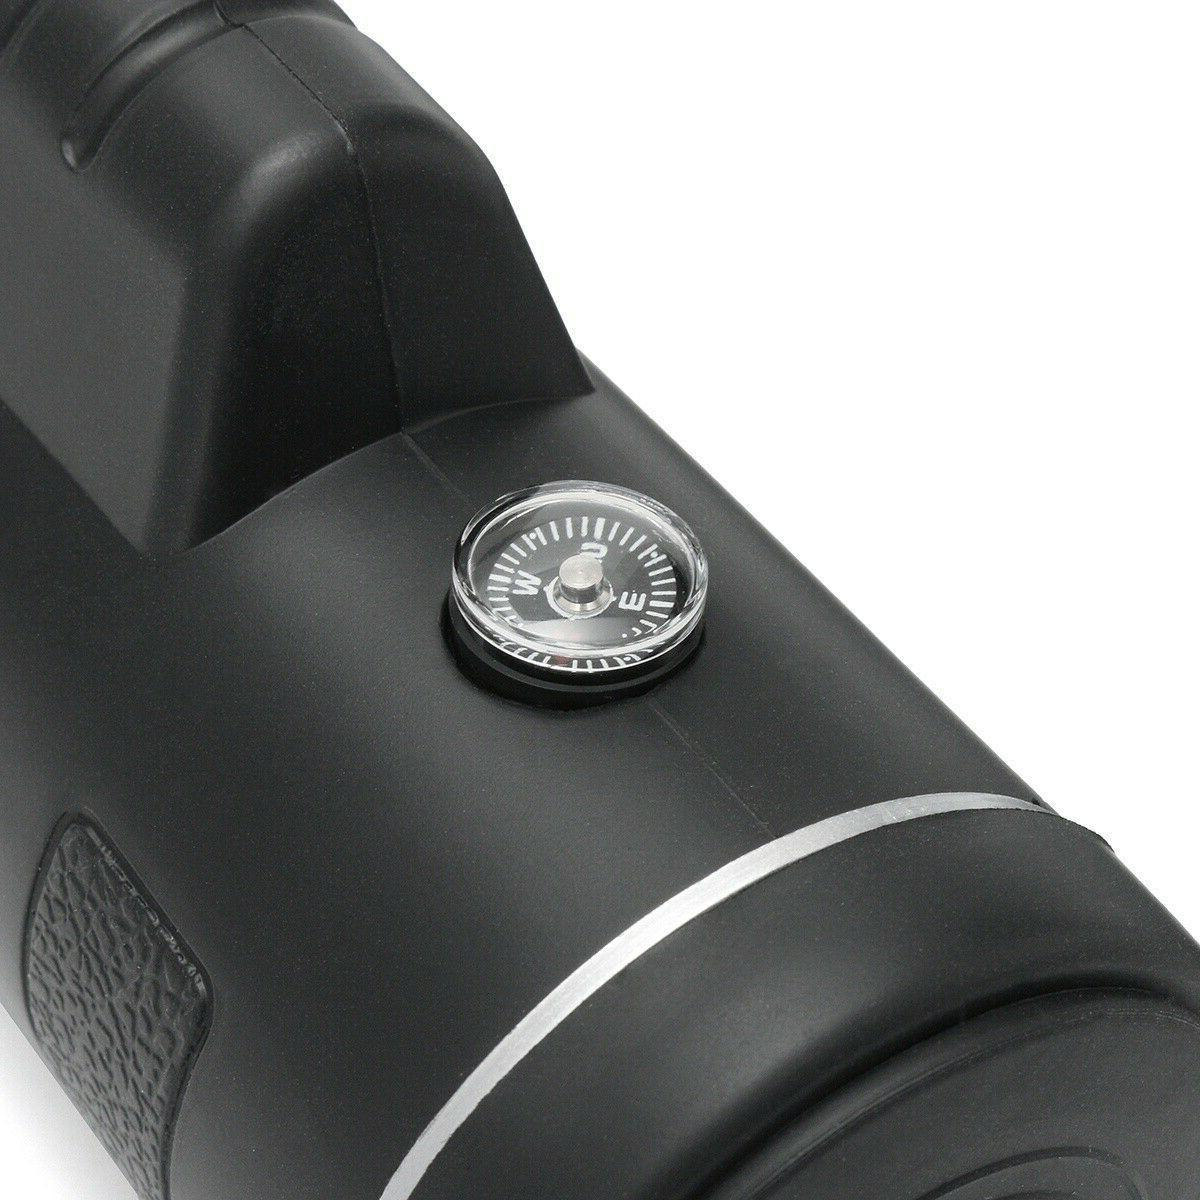 Monocular Focusing Adjustment HD Pocket Scope Hunting